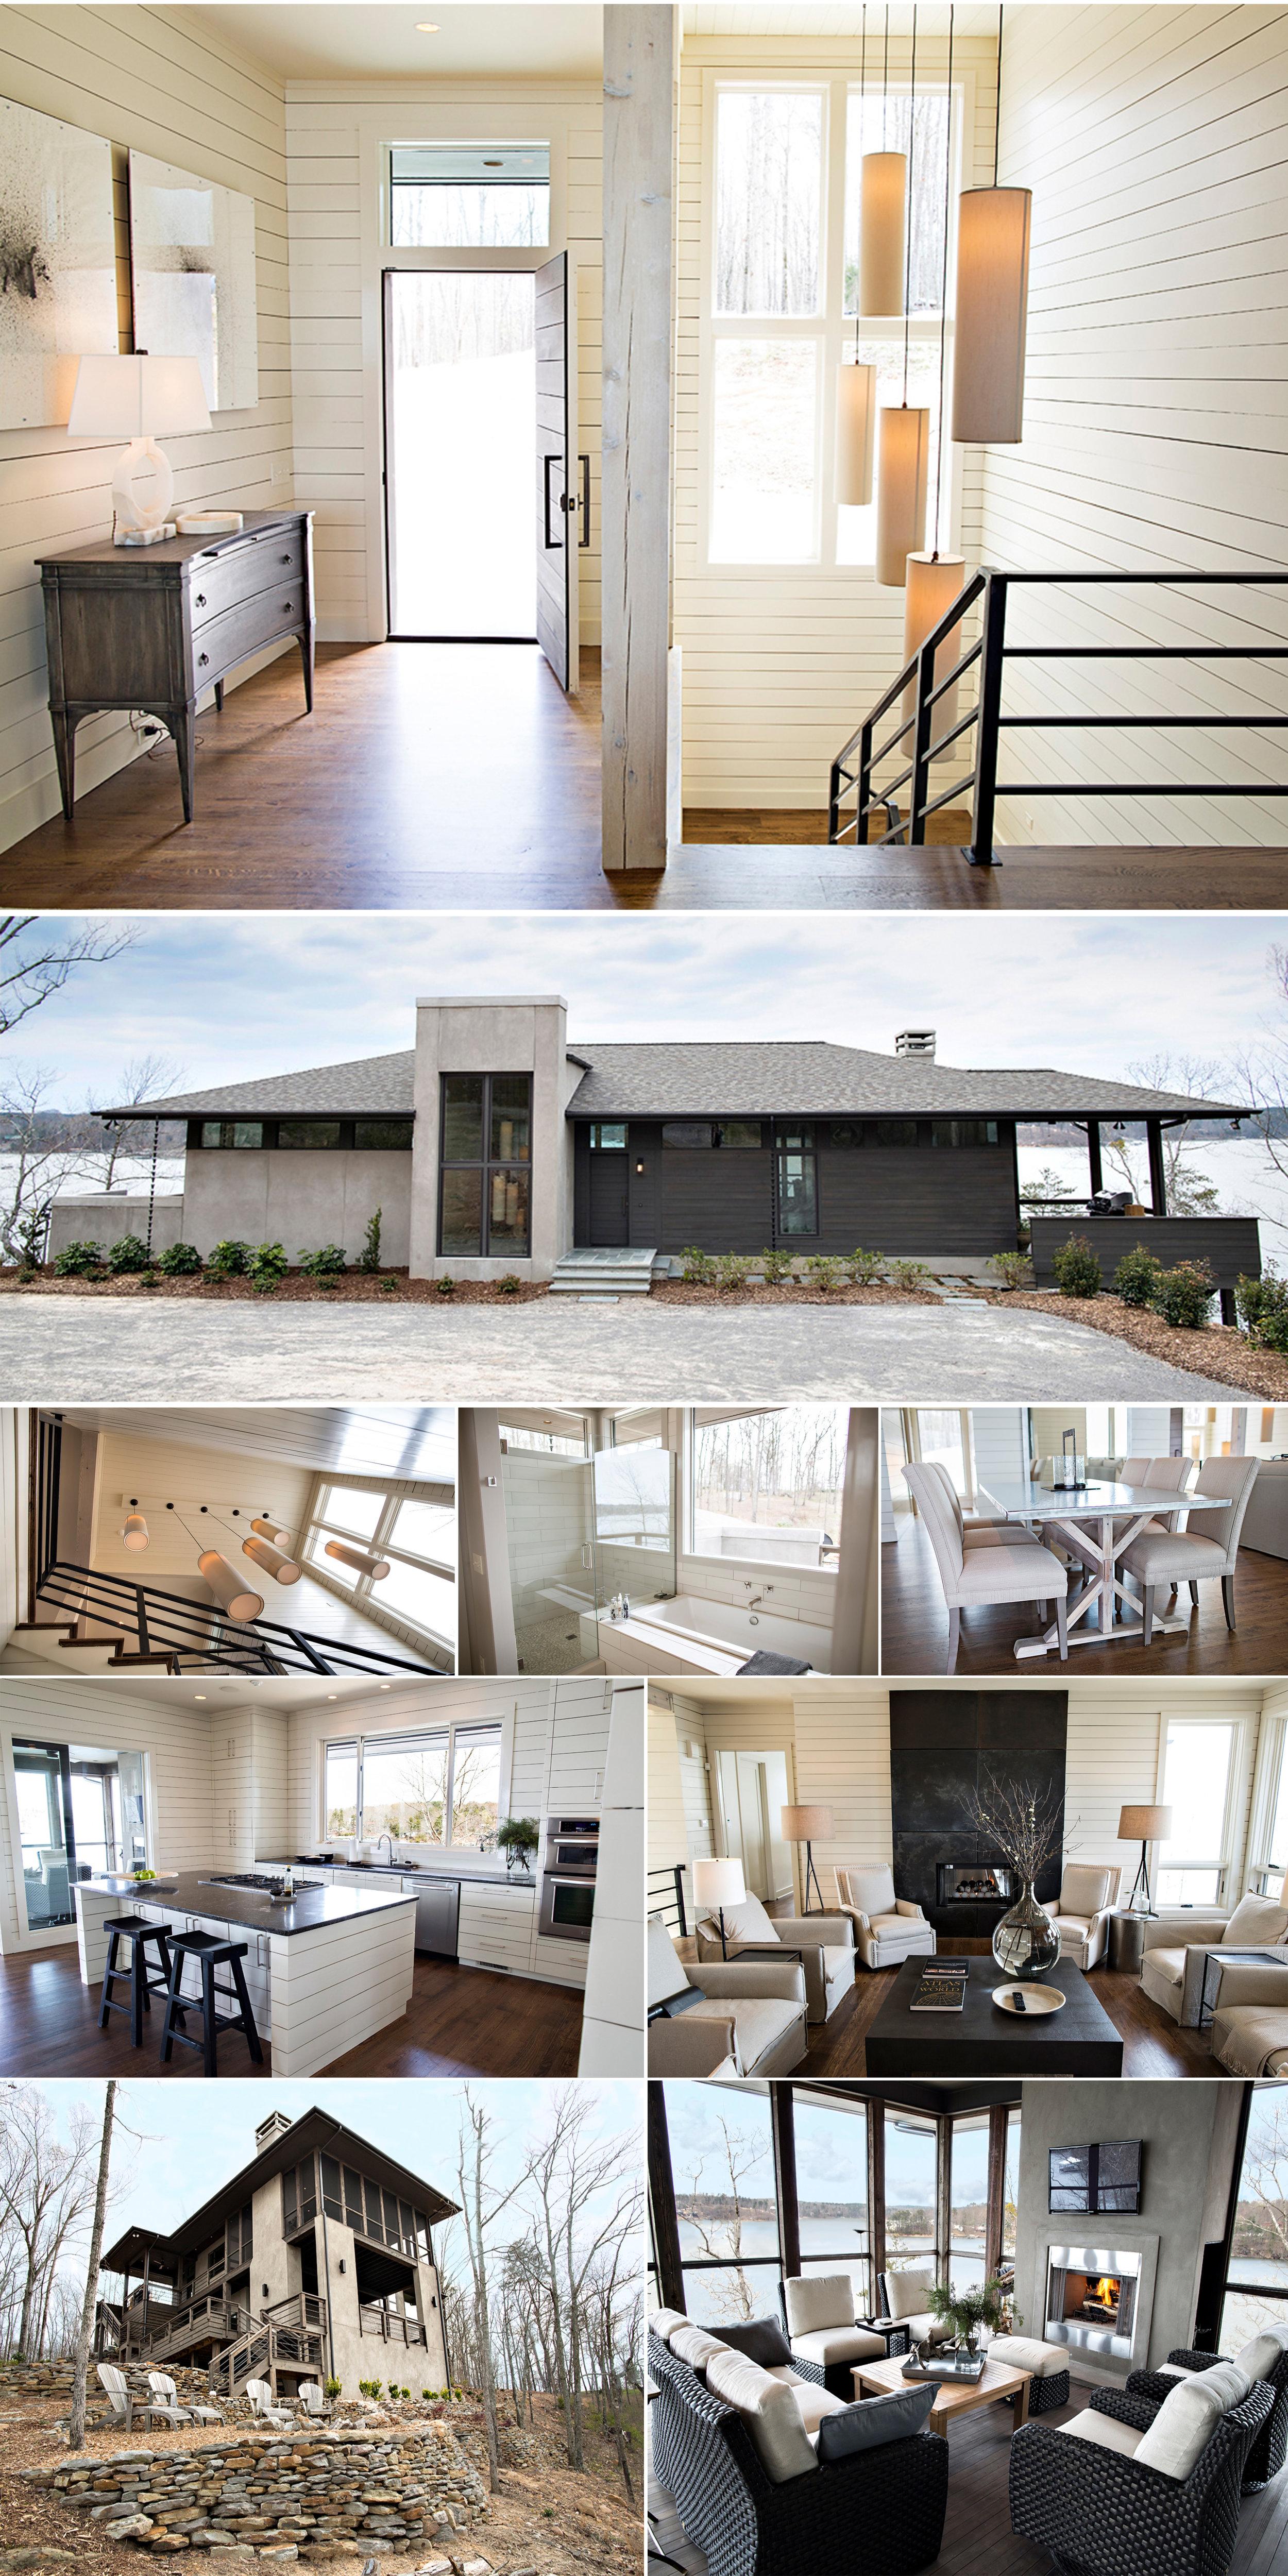 Lake Living collage exterior and interior design architecture Alabama